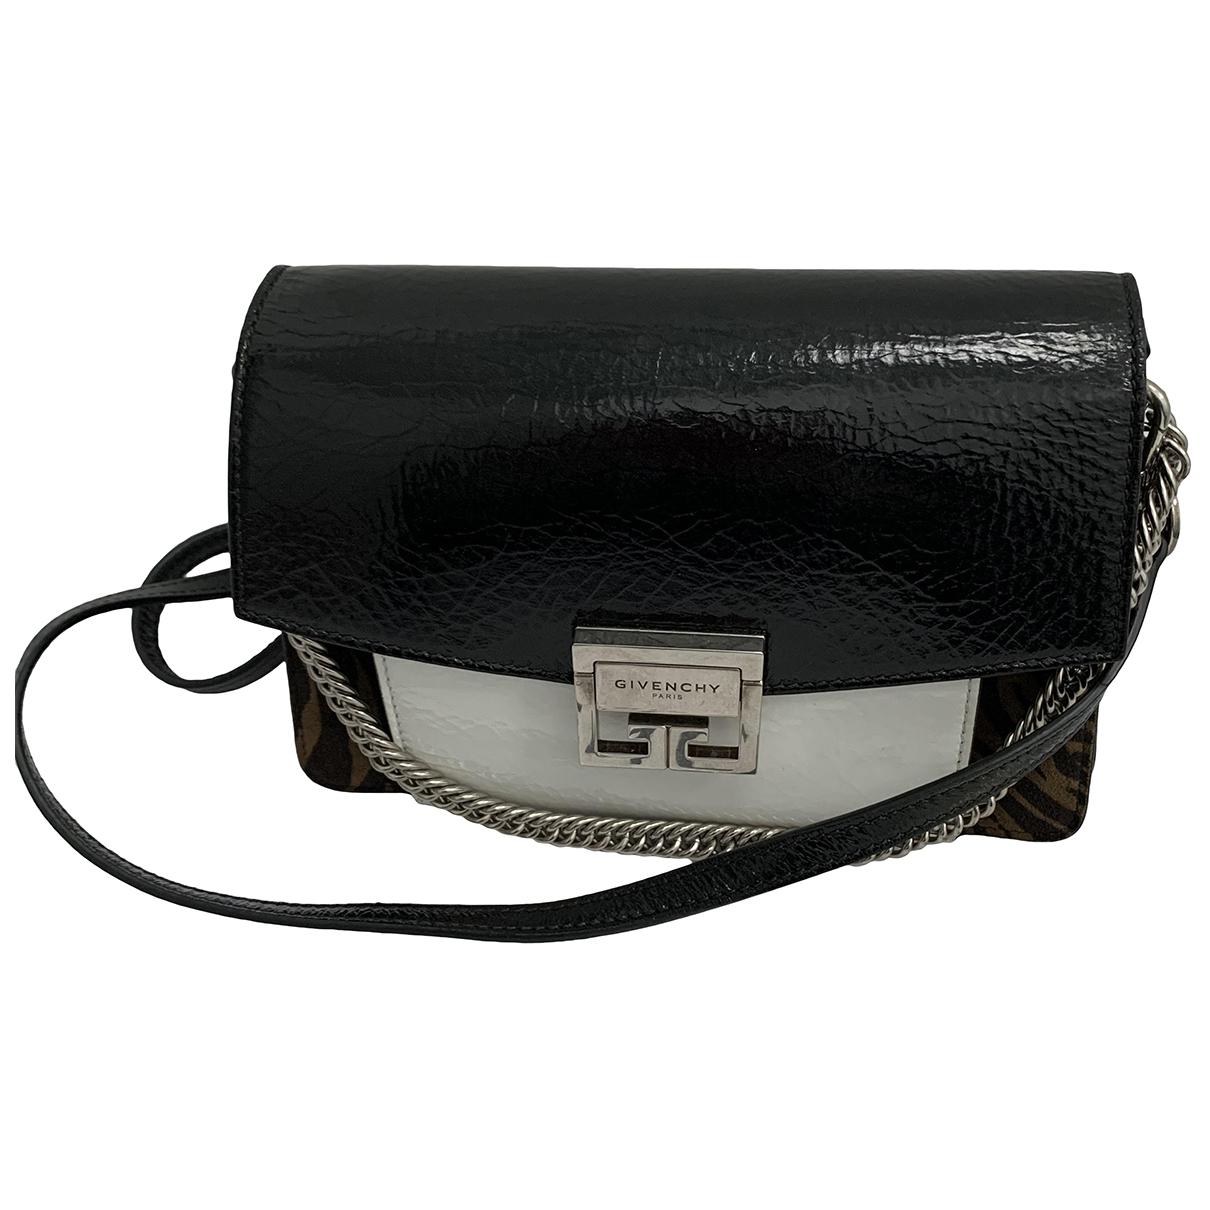 Givenchy GV3 Multicolour Leather handbag for Women \N